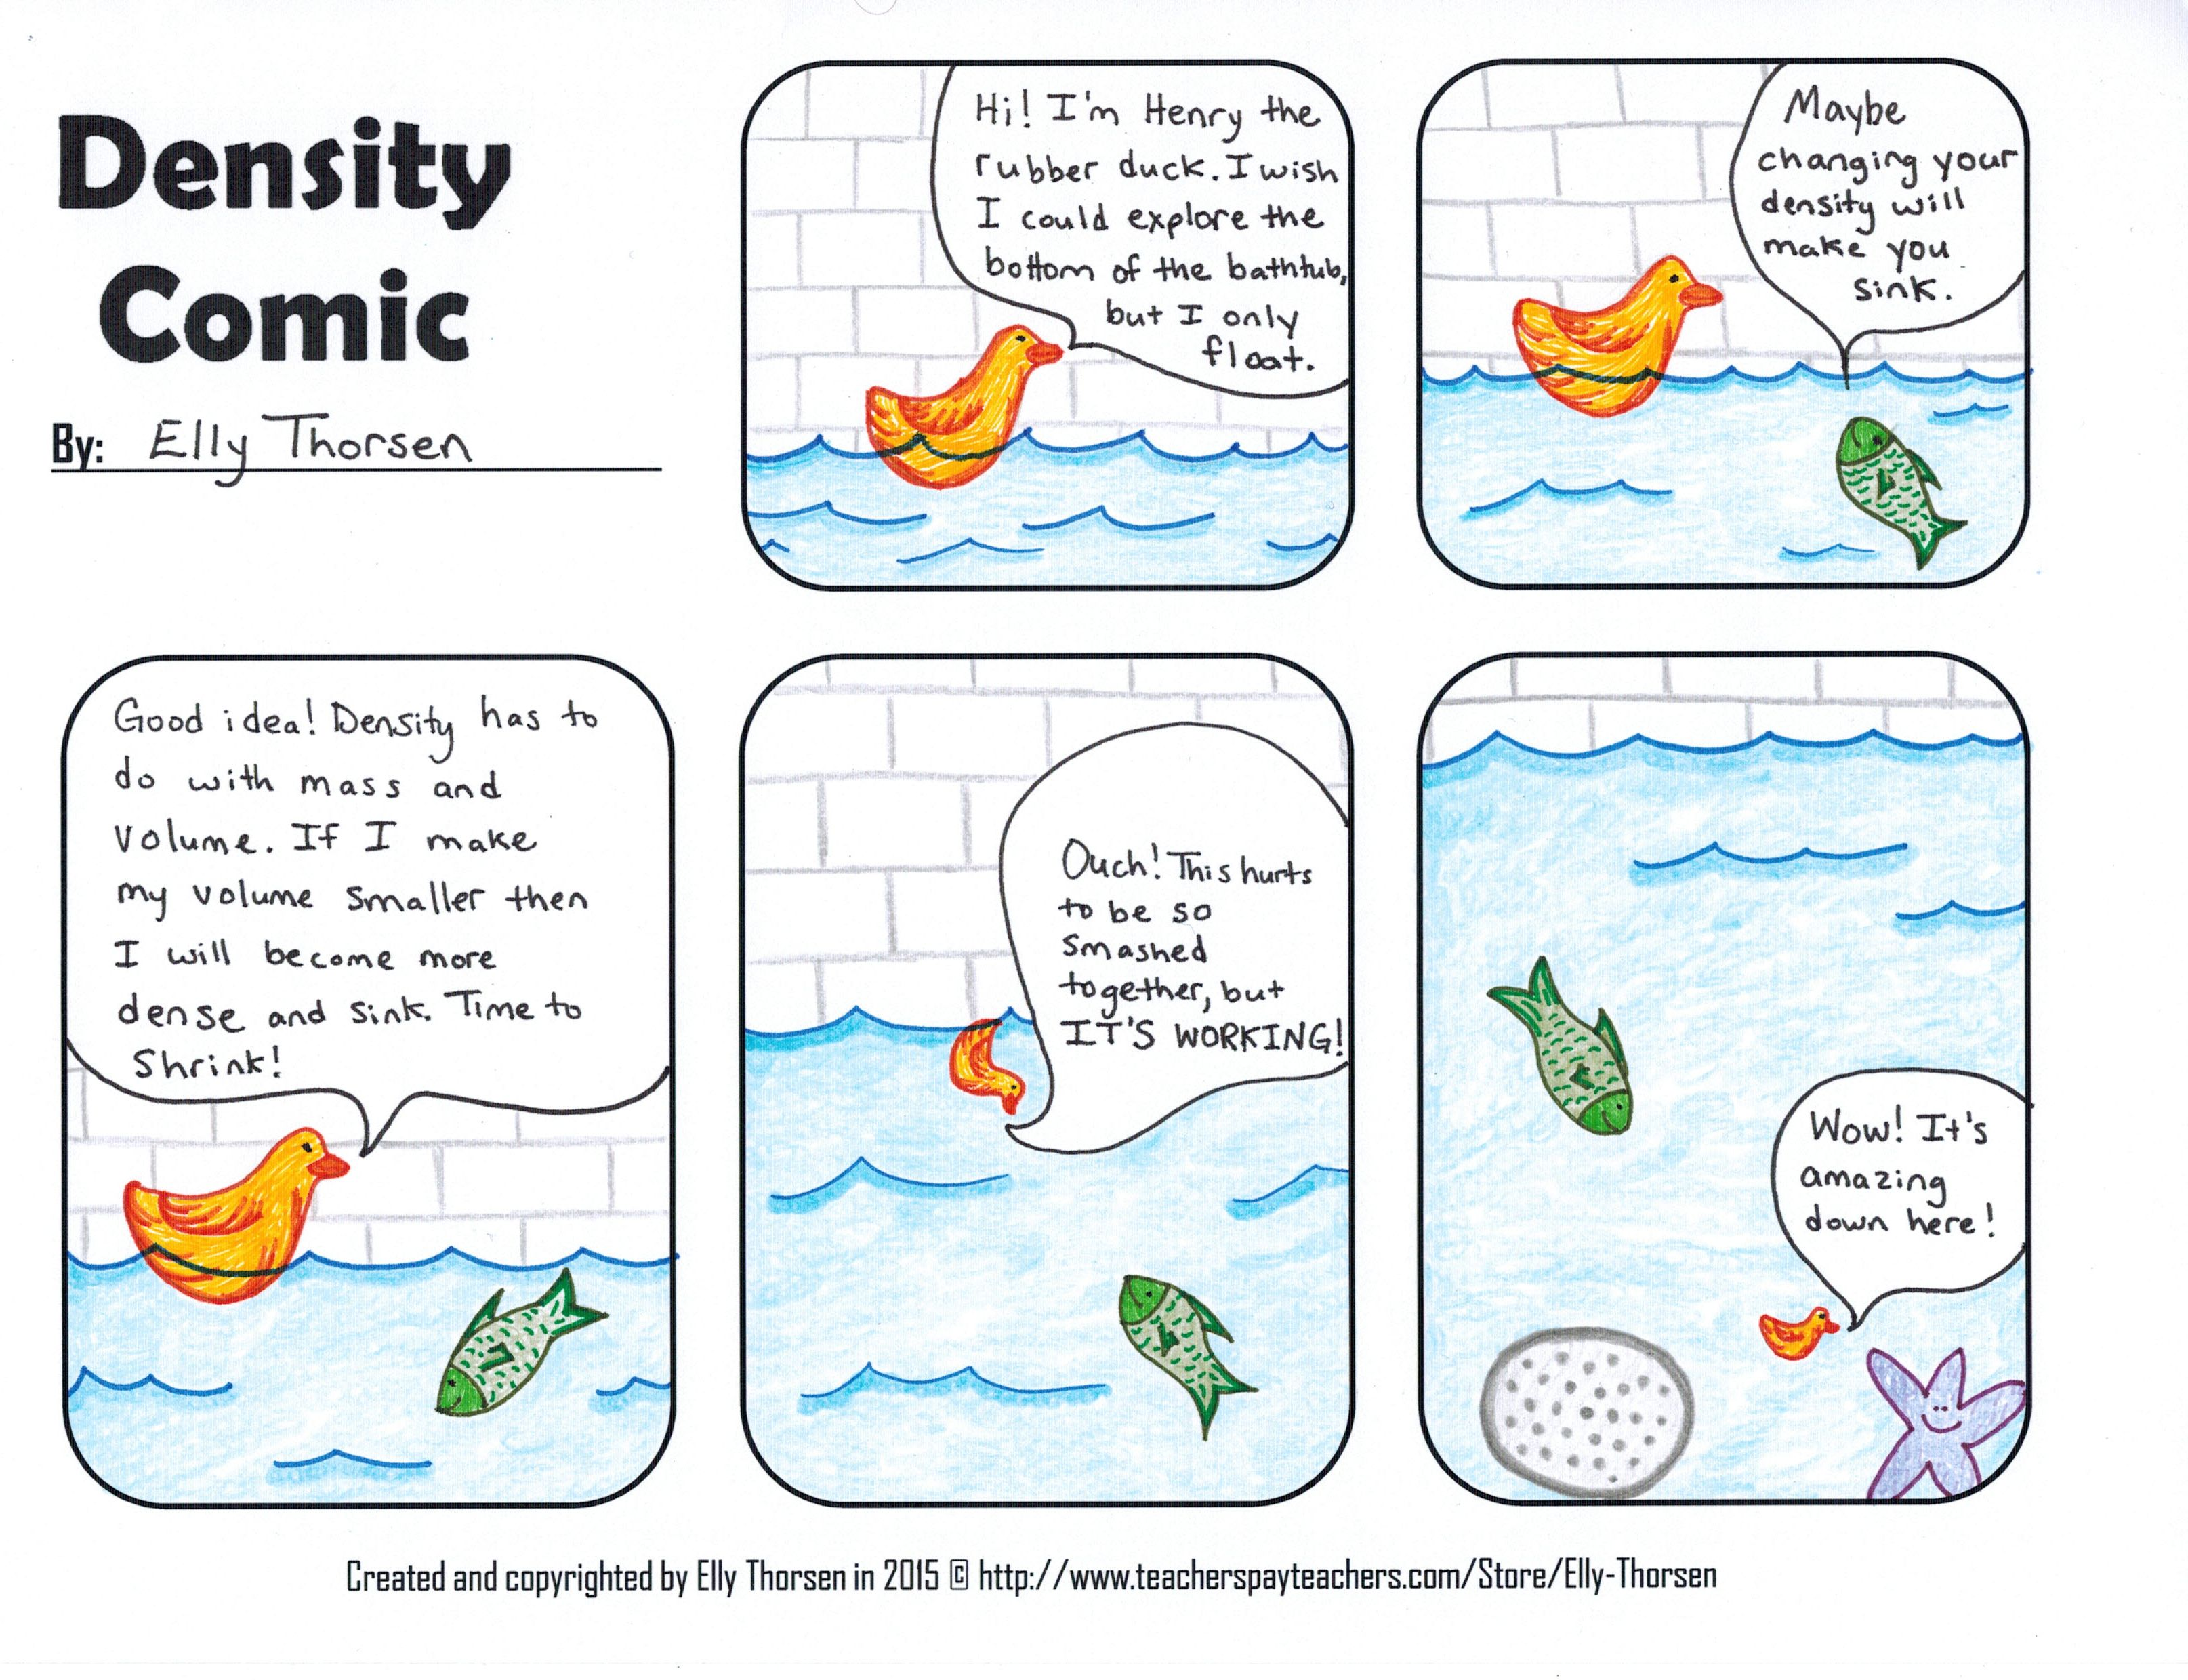 Density Comic Science process skills, Geometry